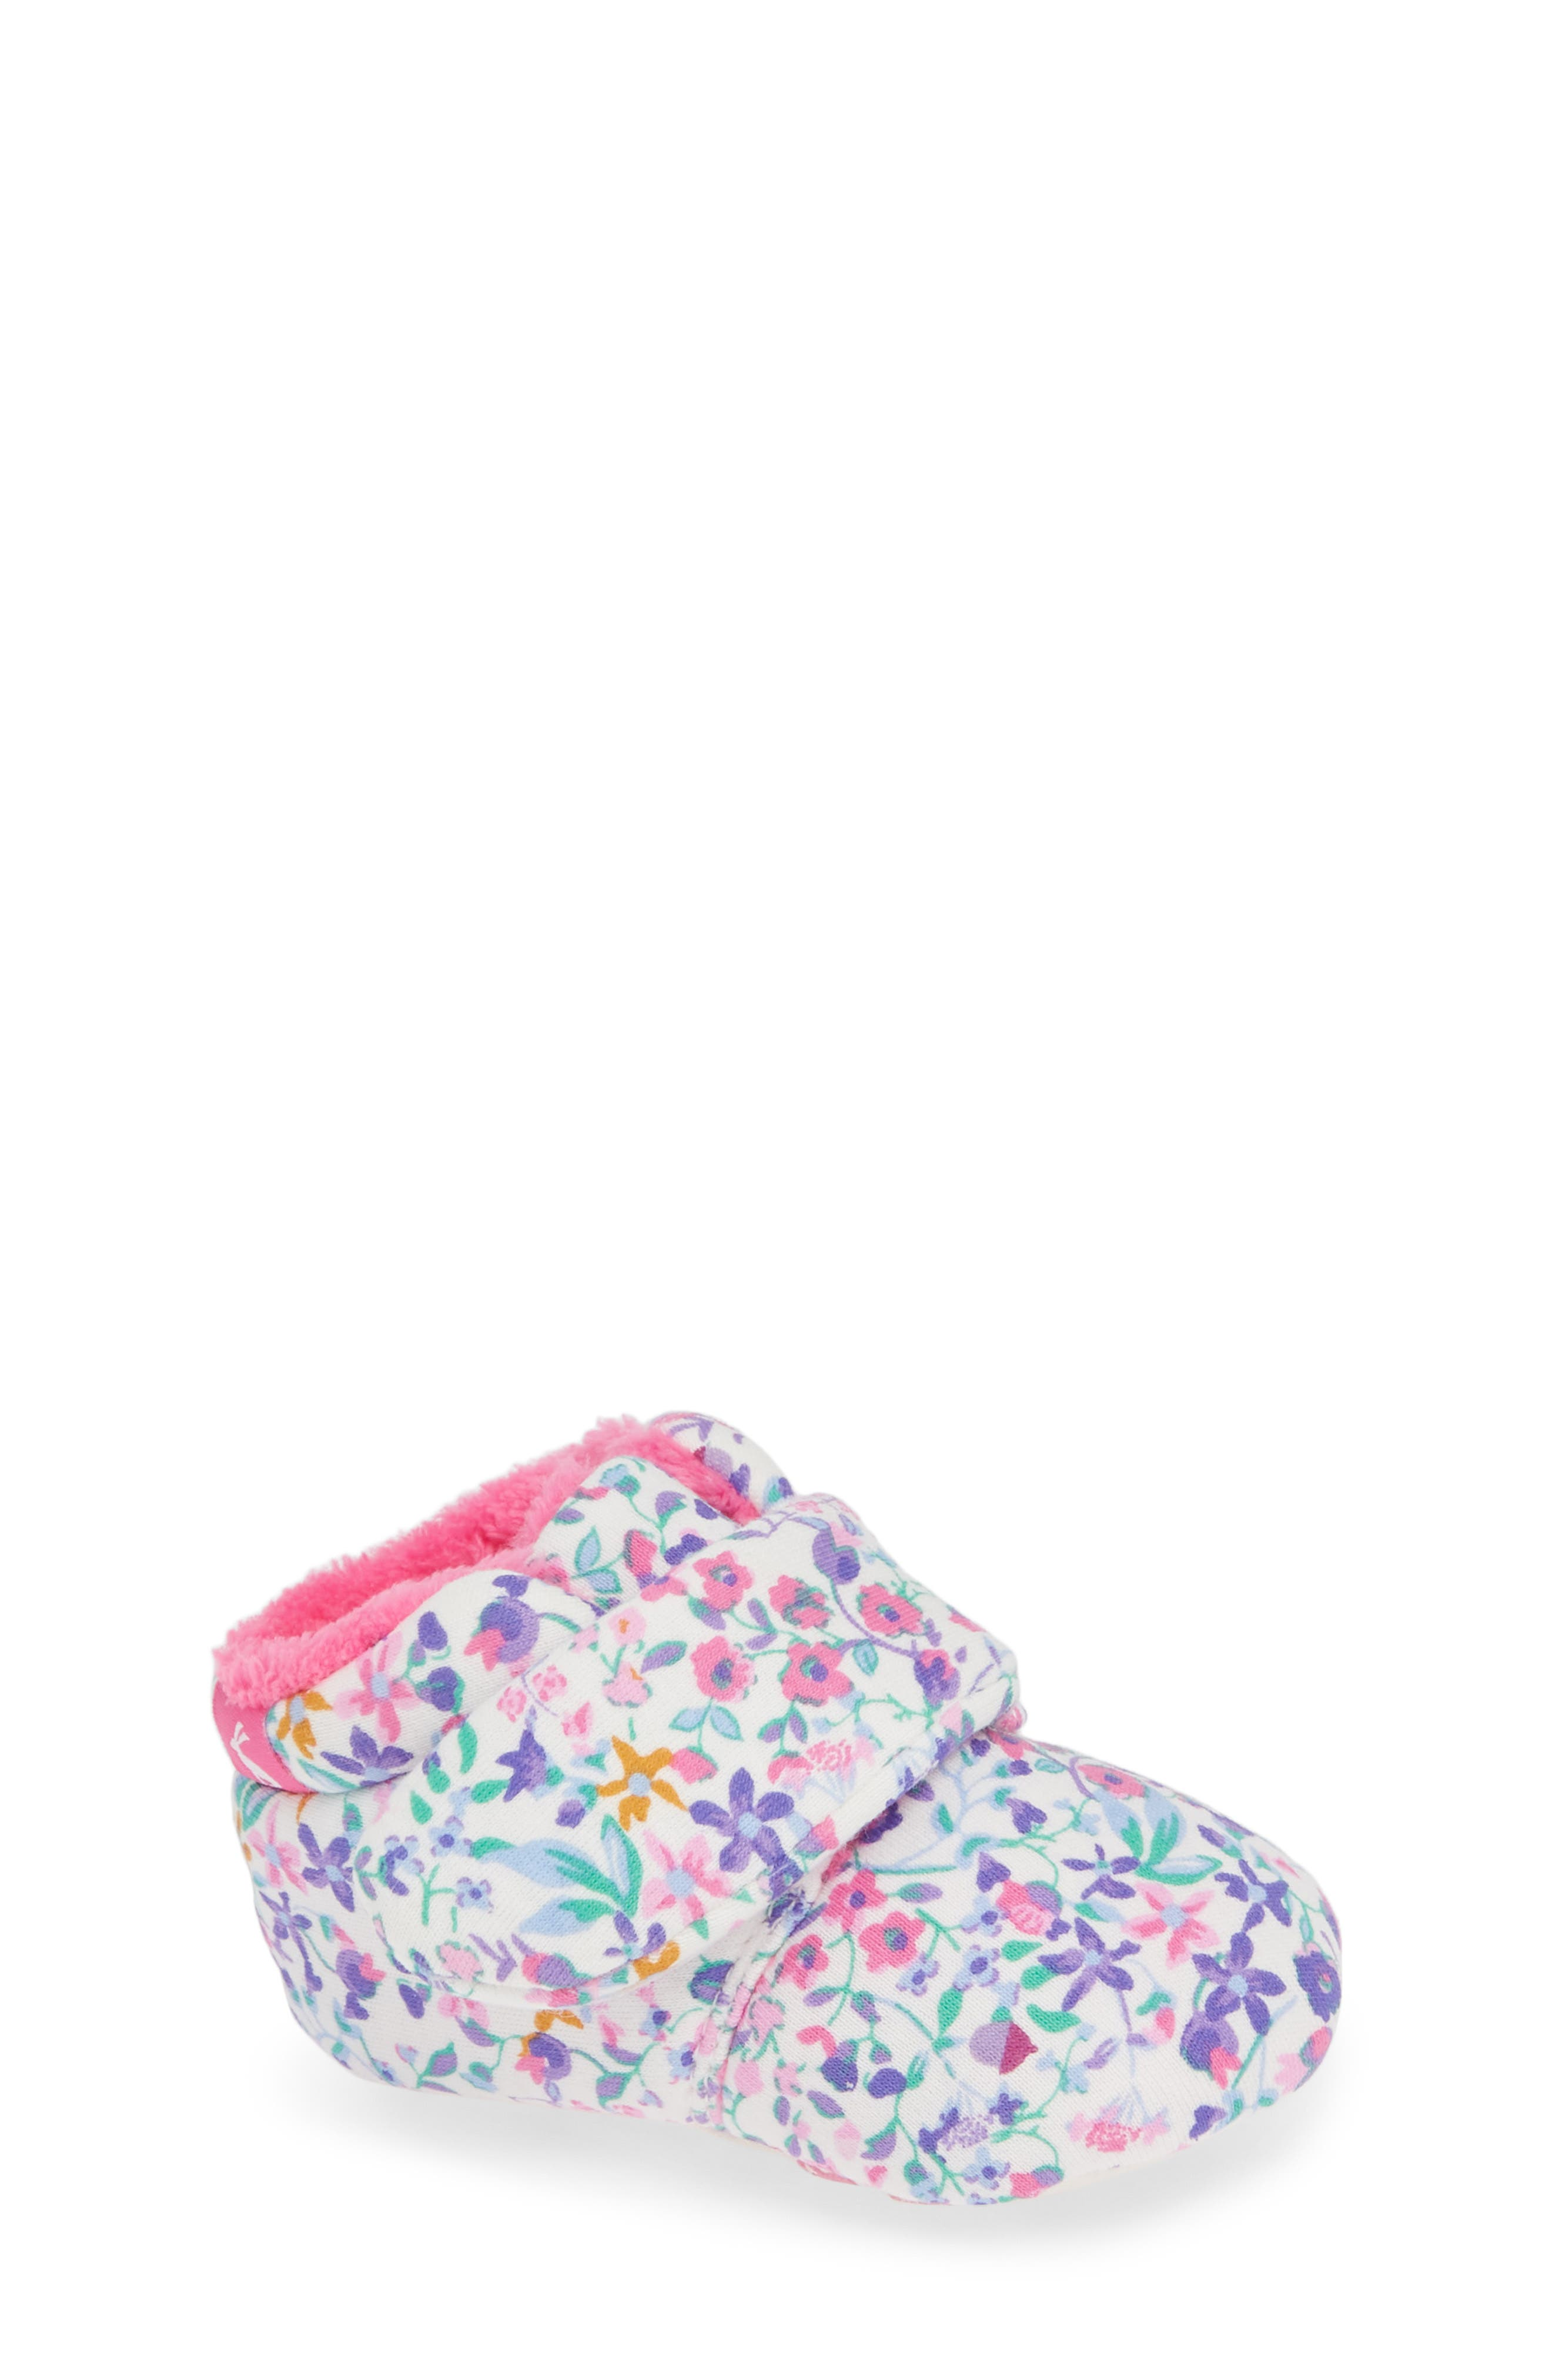 Crib Shoe,                             Main thumbnail 1, color,                             ACORN DITSY